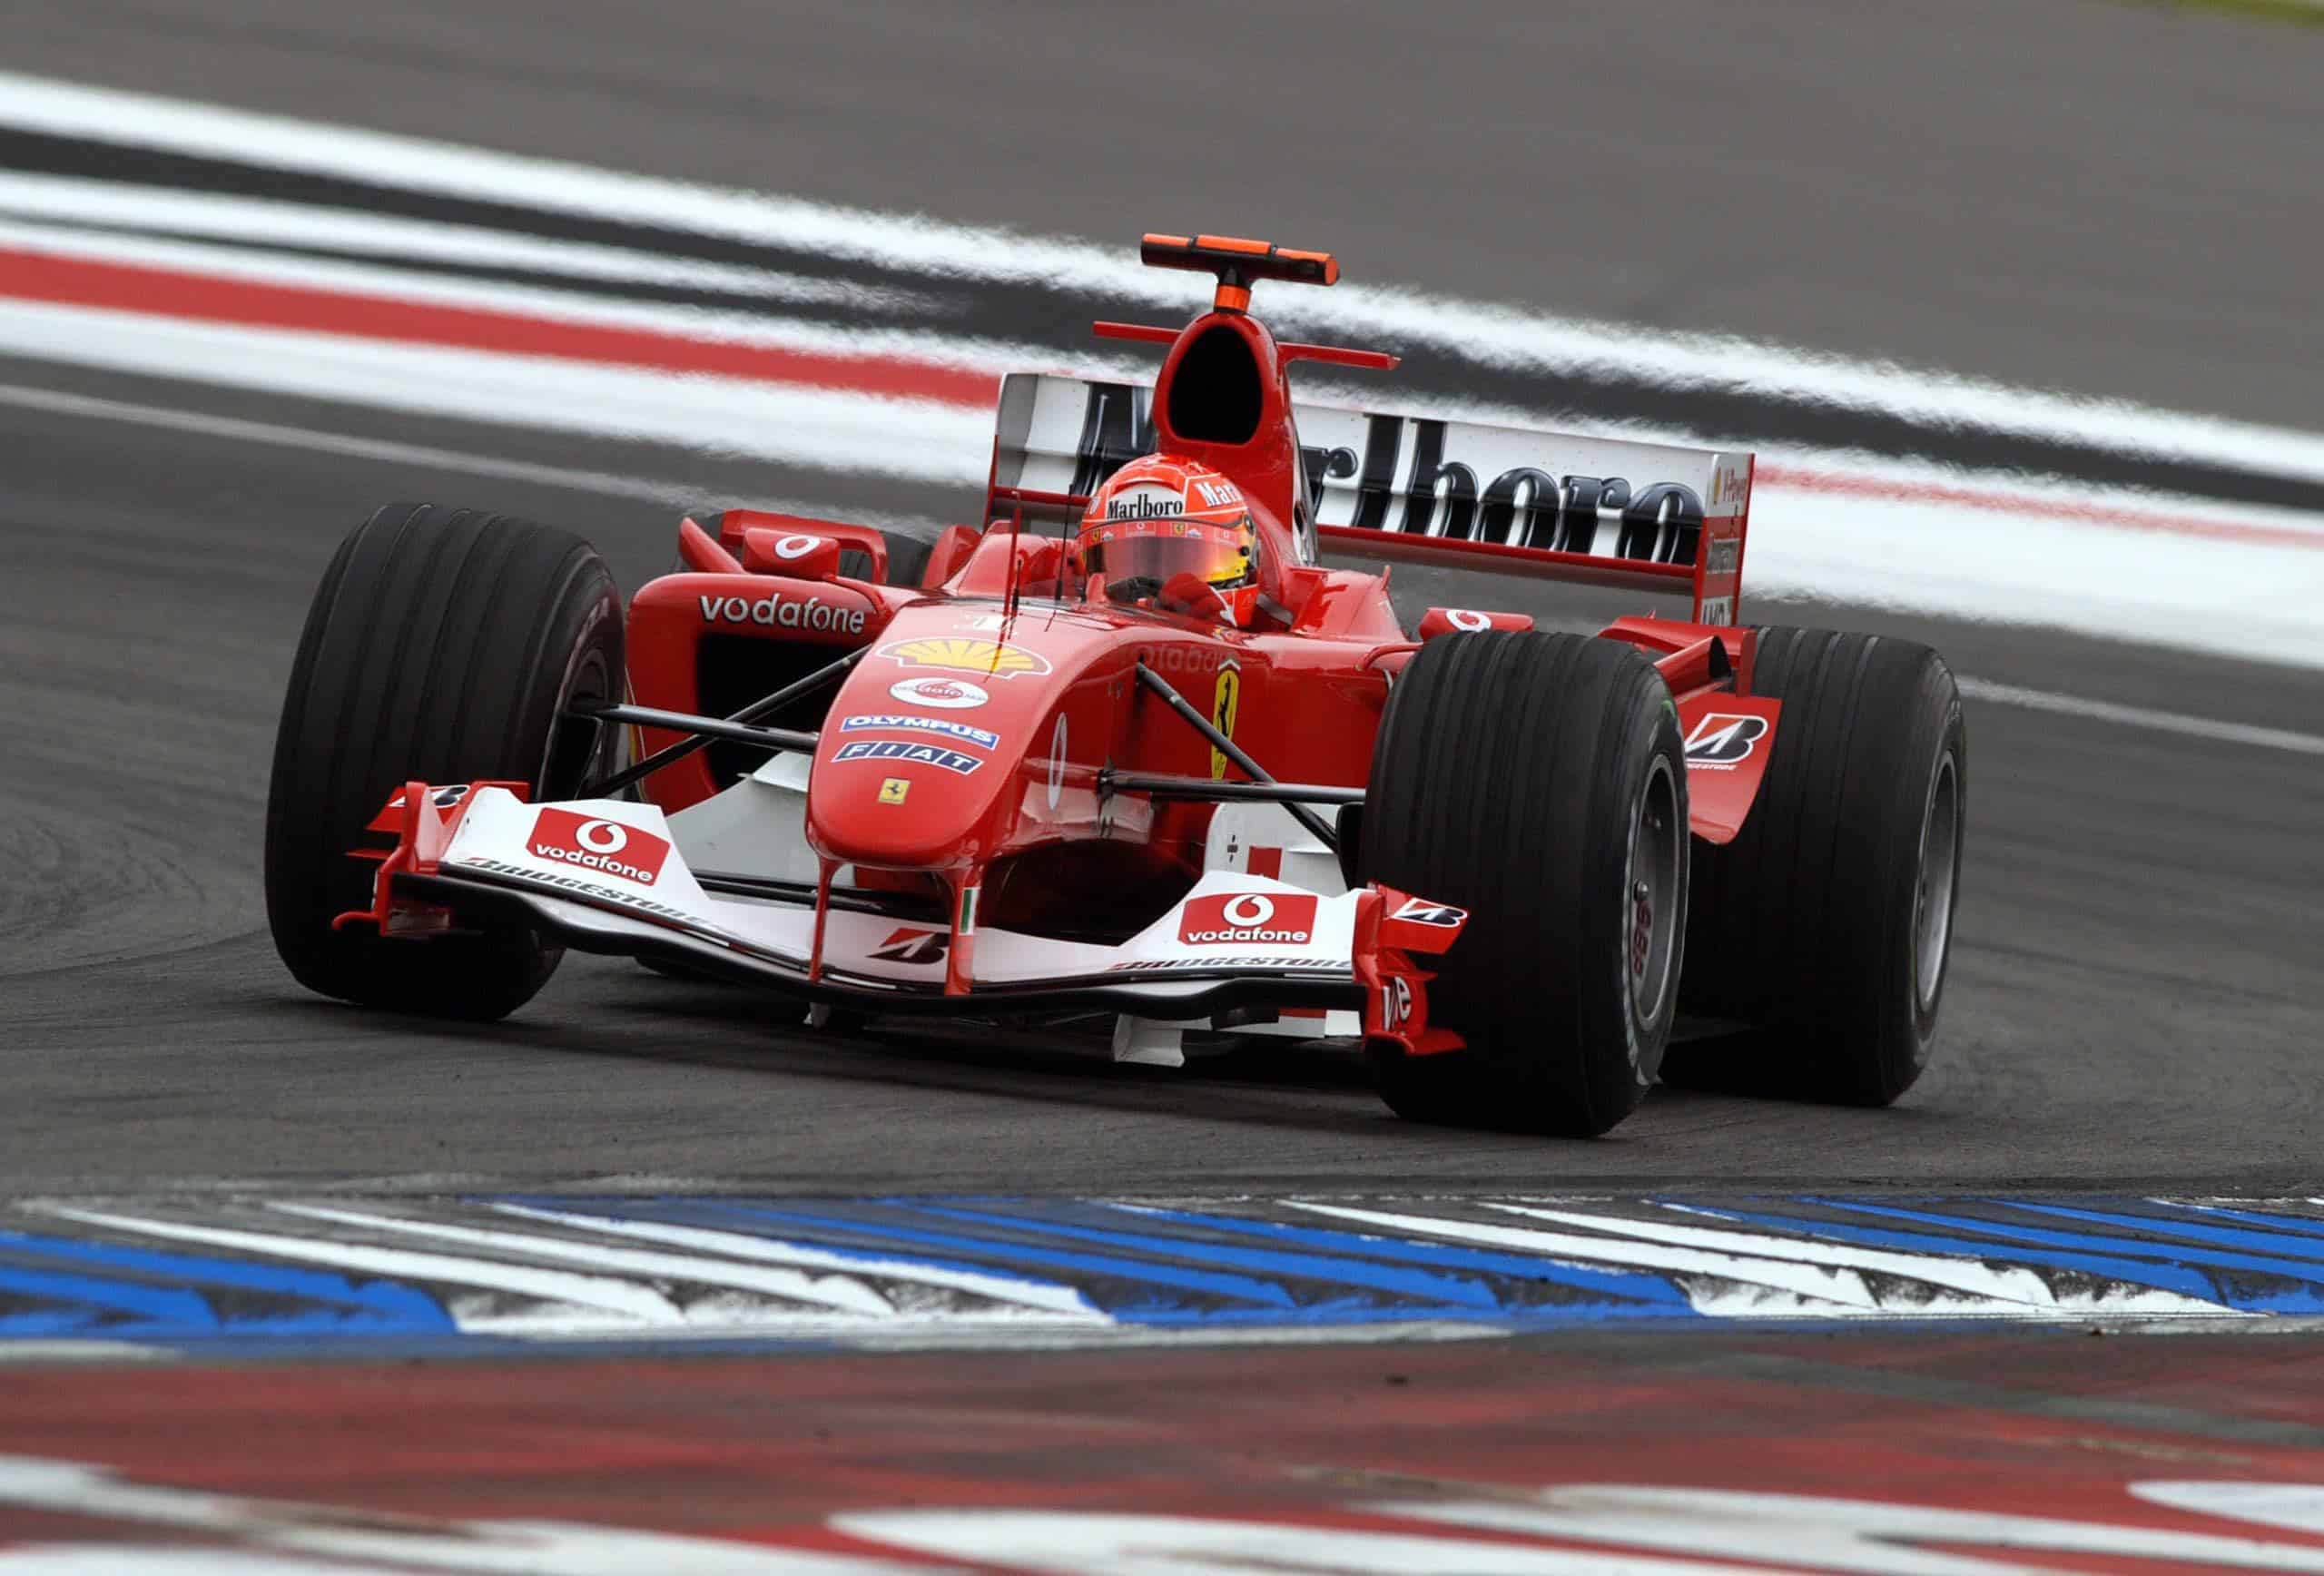 Michael-Schumacher-Ferrari-F2004-German-GP-F1-2004-Hockenheim-Photo-Ferrari